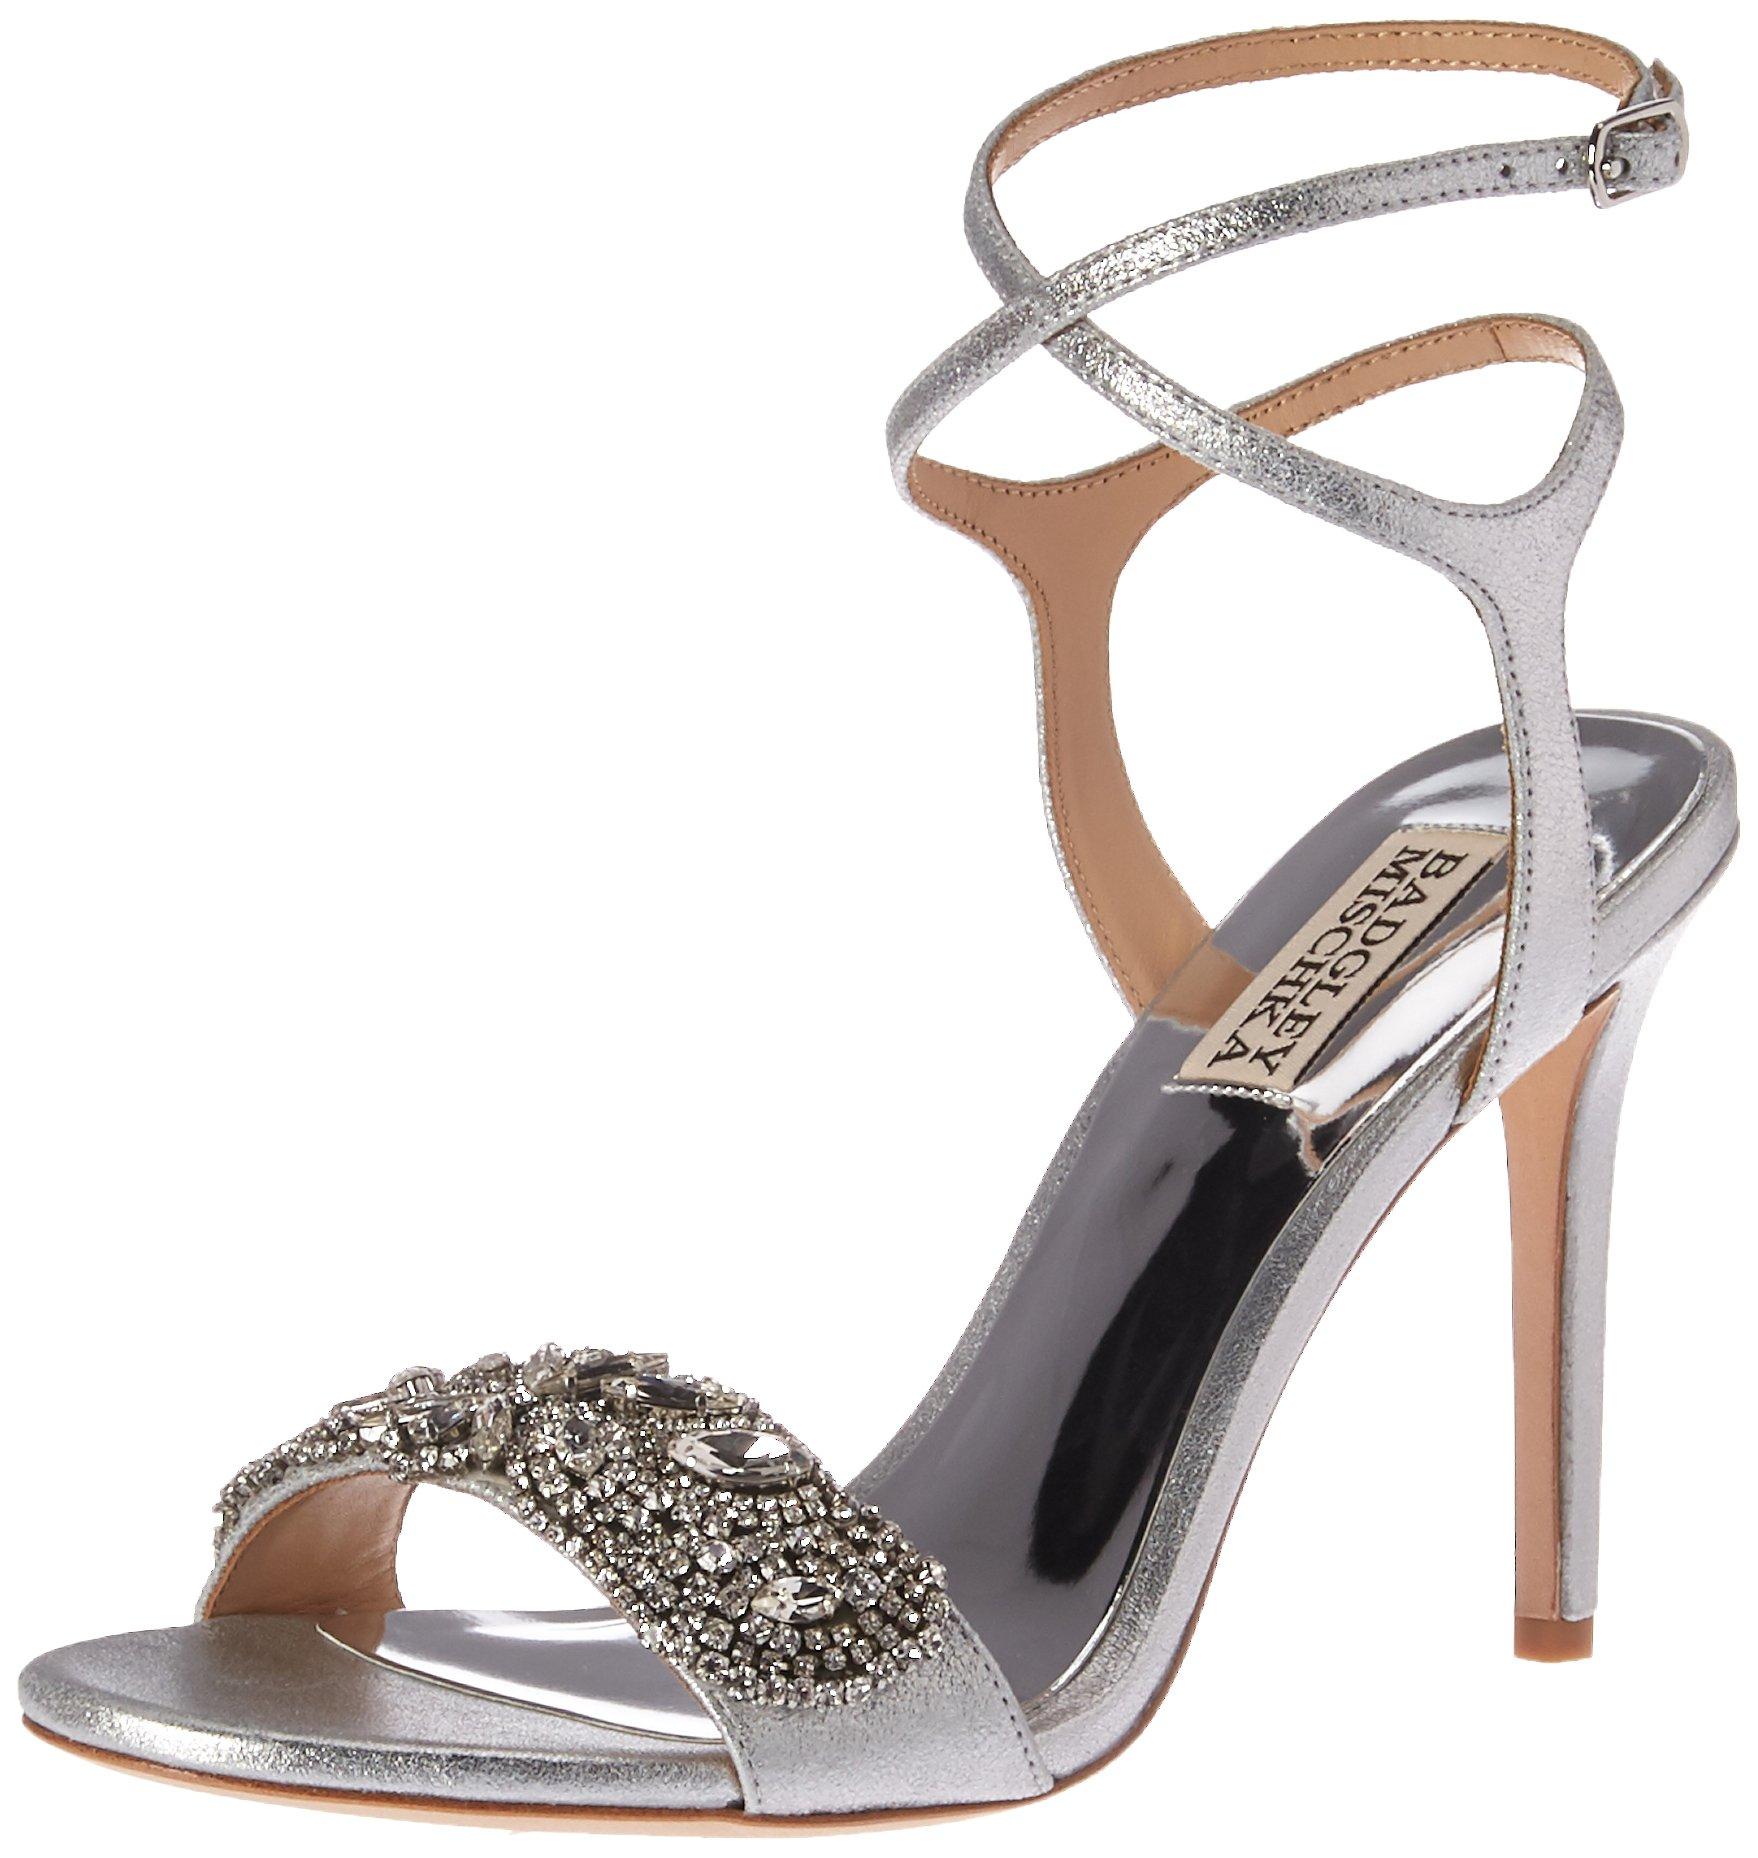 Badgley Mischka Women's Hailey Heeled Sandal, Silver, 10 M US